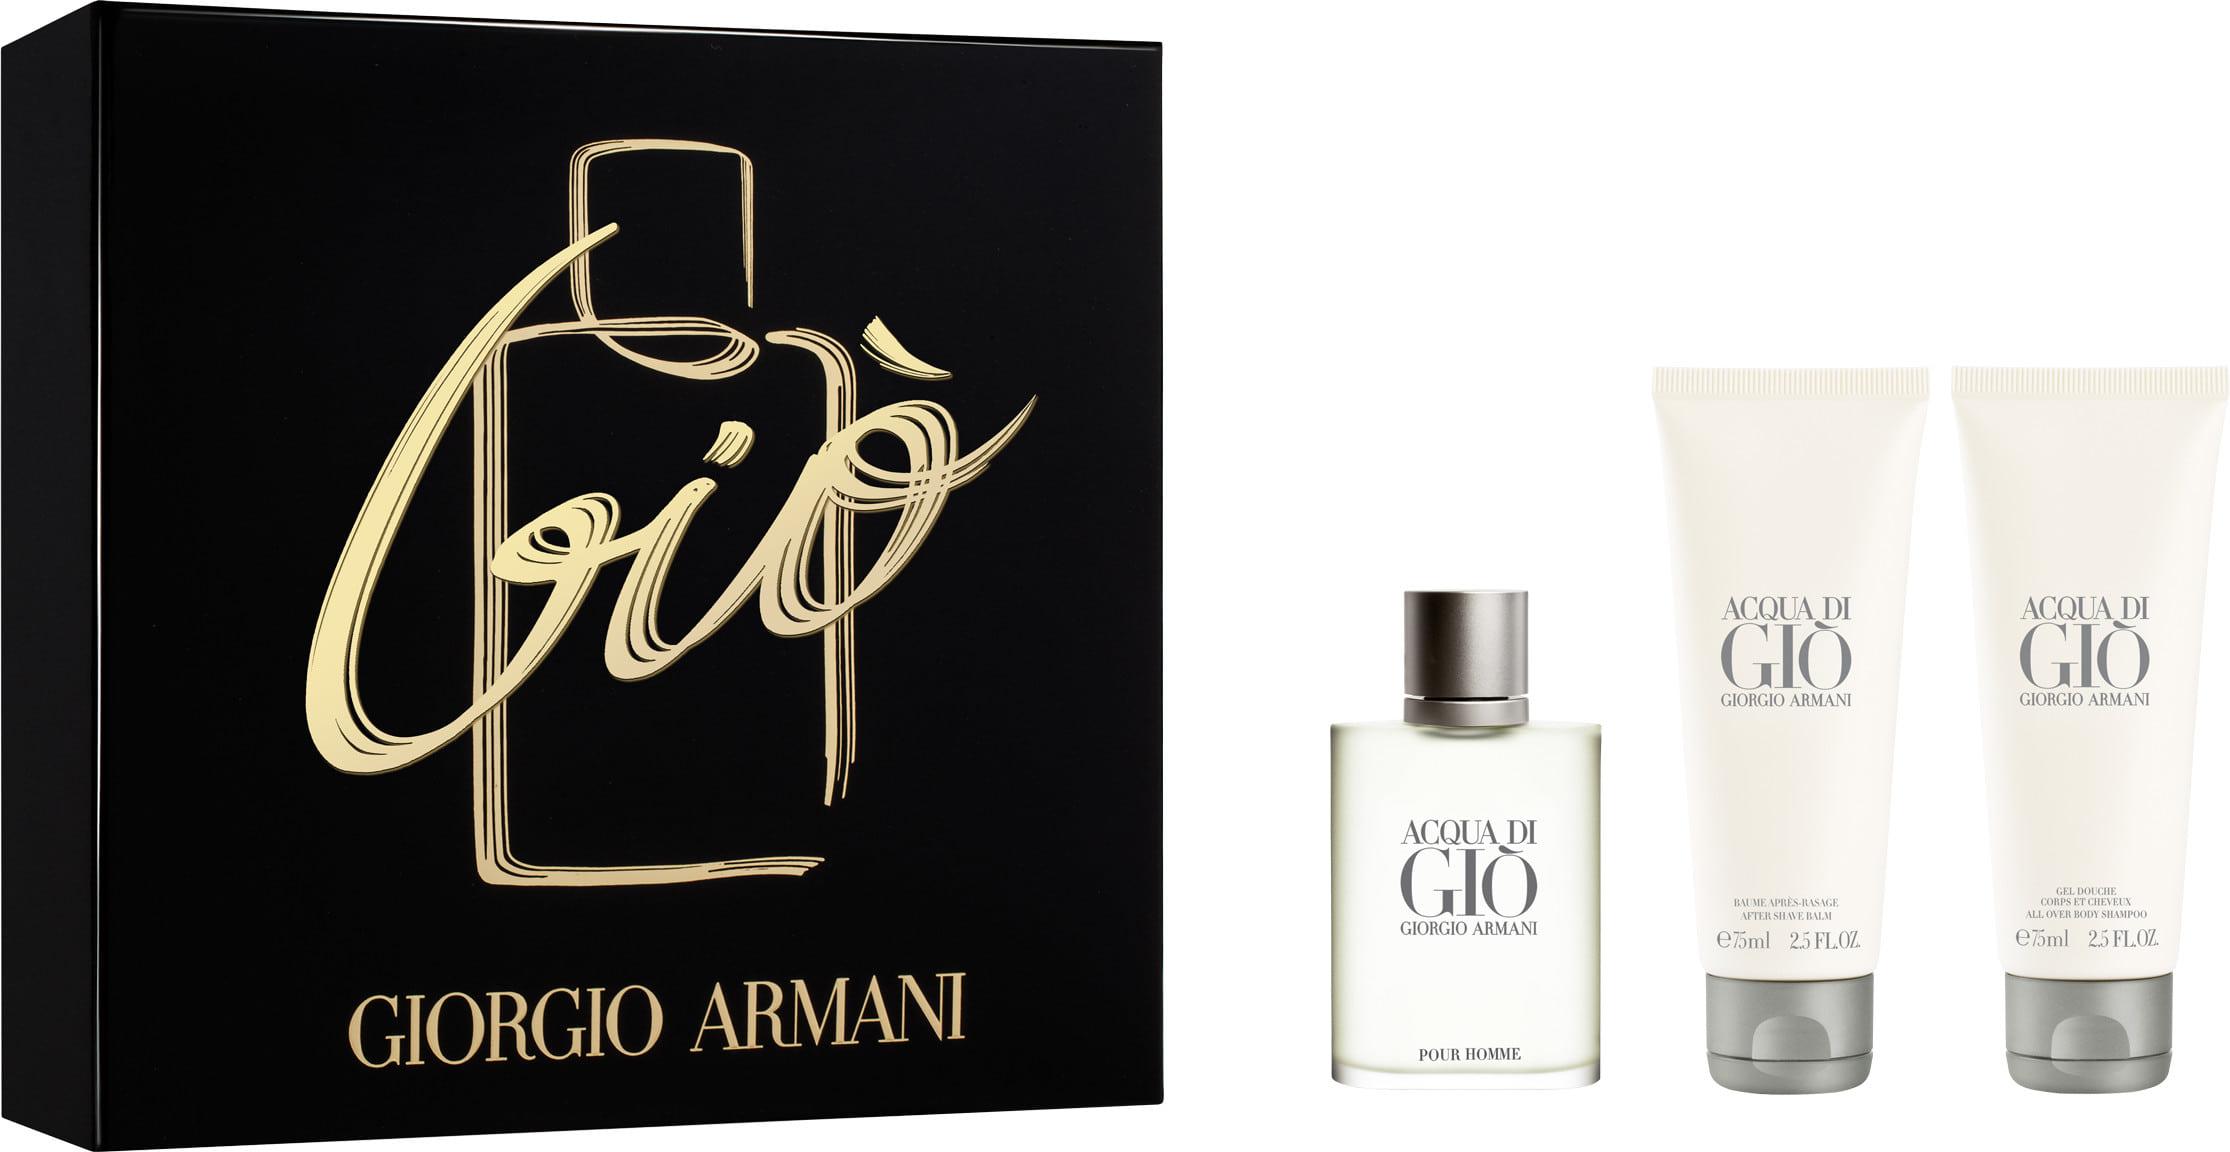 Giorgio Armani Acqua di Gio Edt 50ml + 75ml After shave balm + 75ml Shower gel 50ml Vīriešu Smaržas